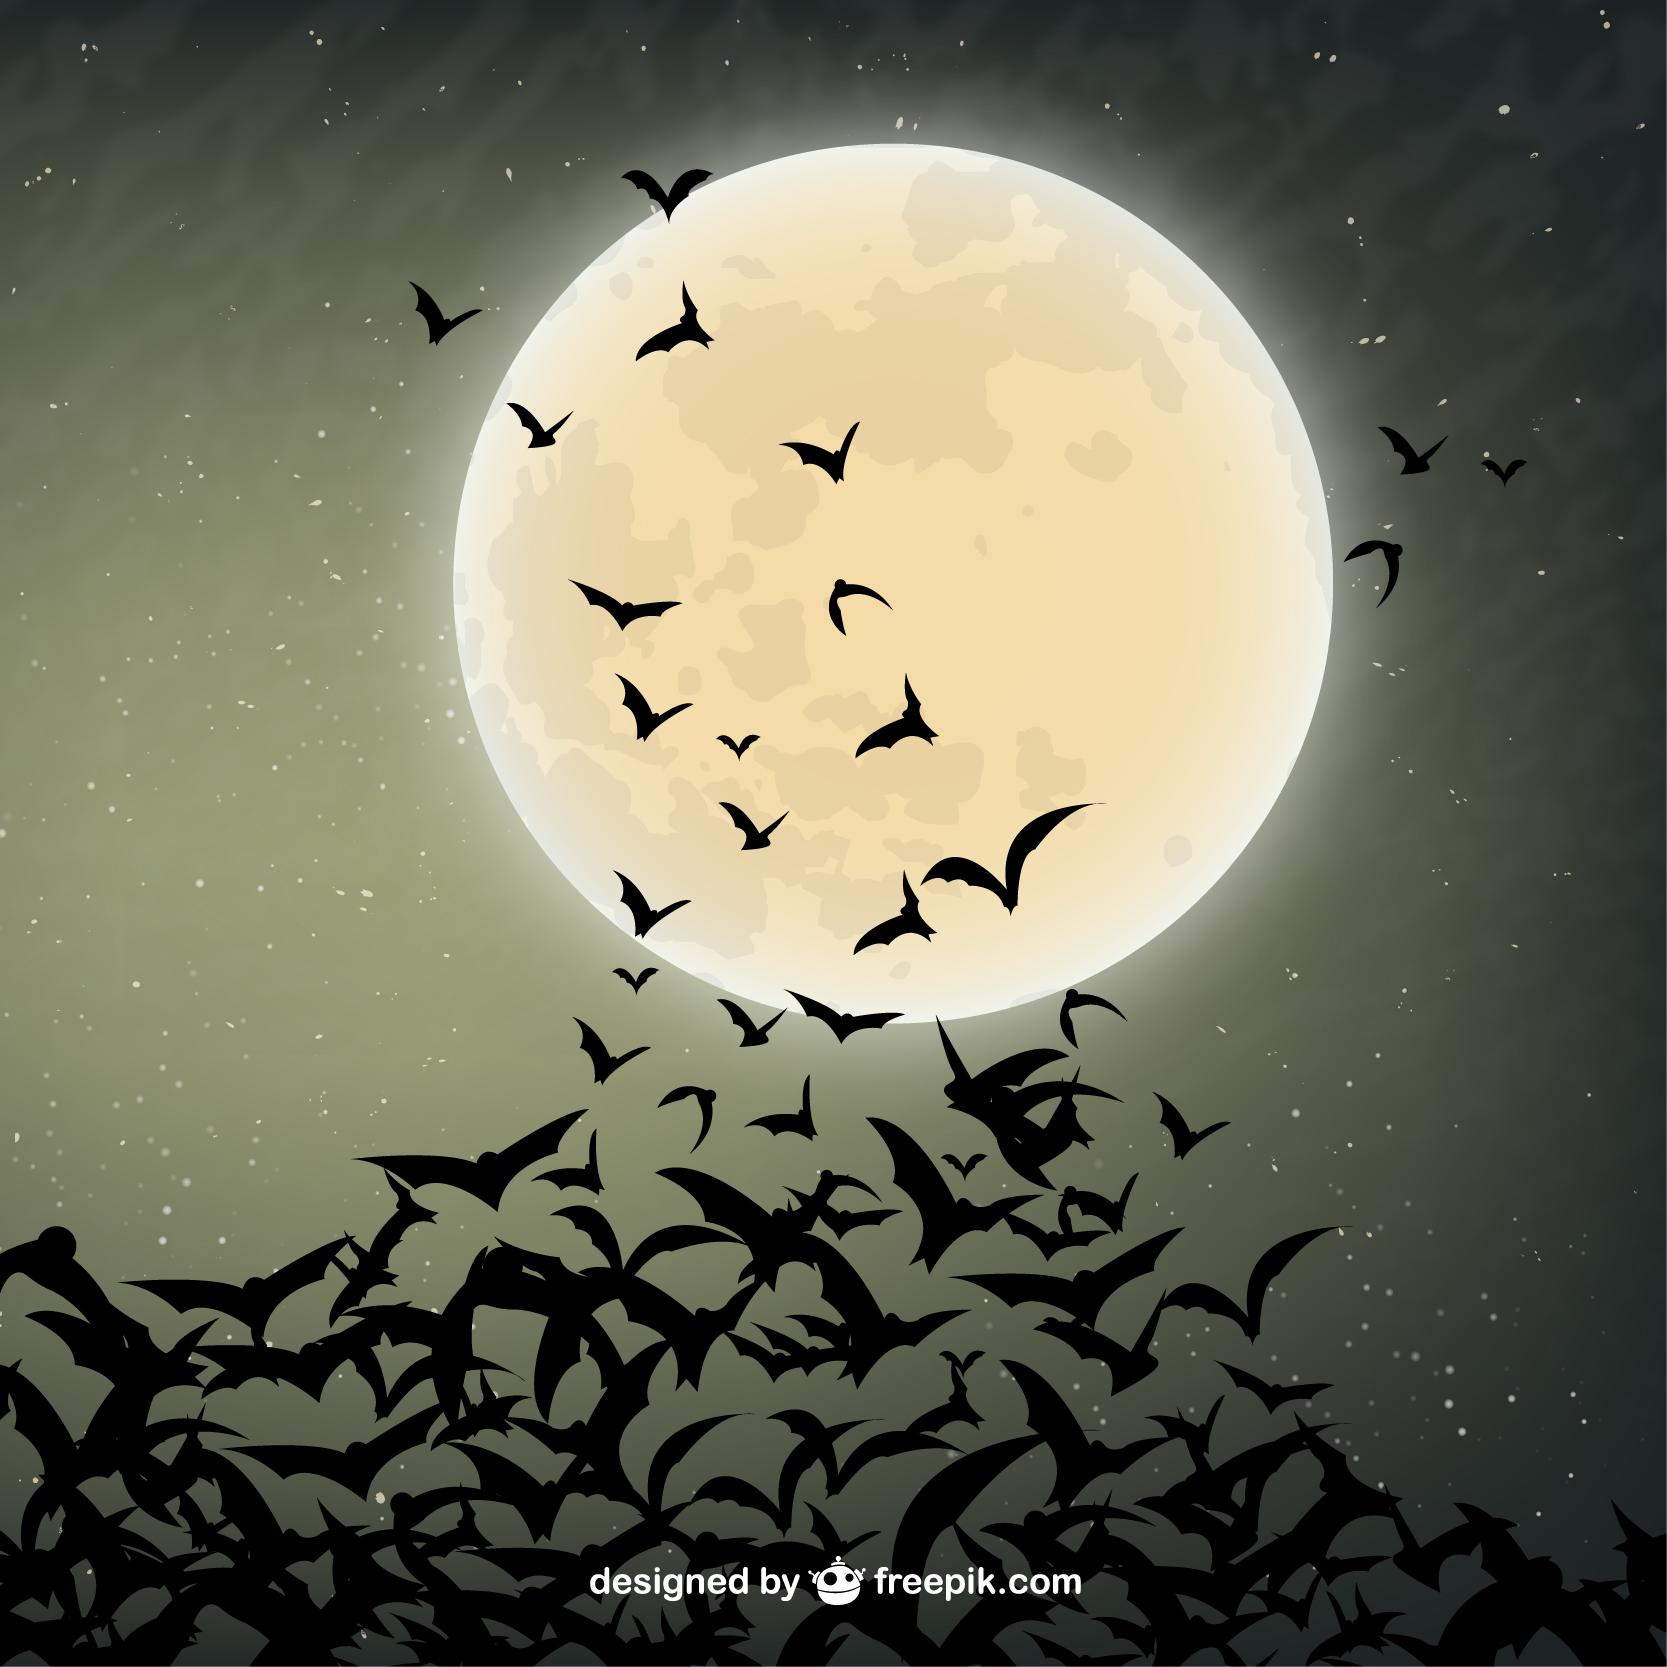 Bats in flight, courtesy of Freepik.com